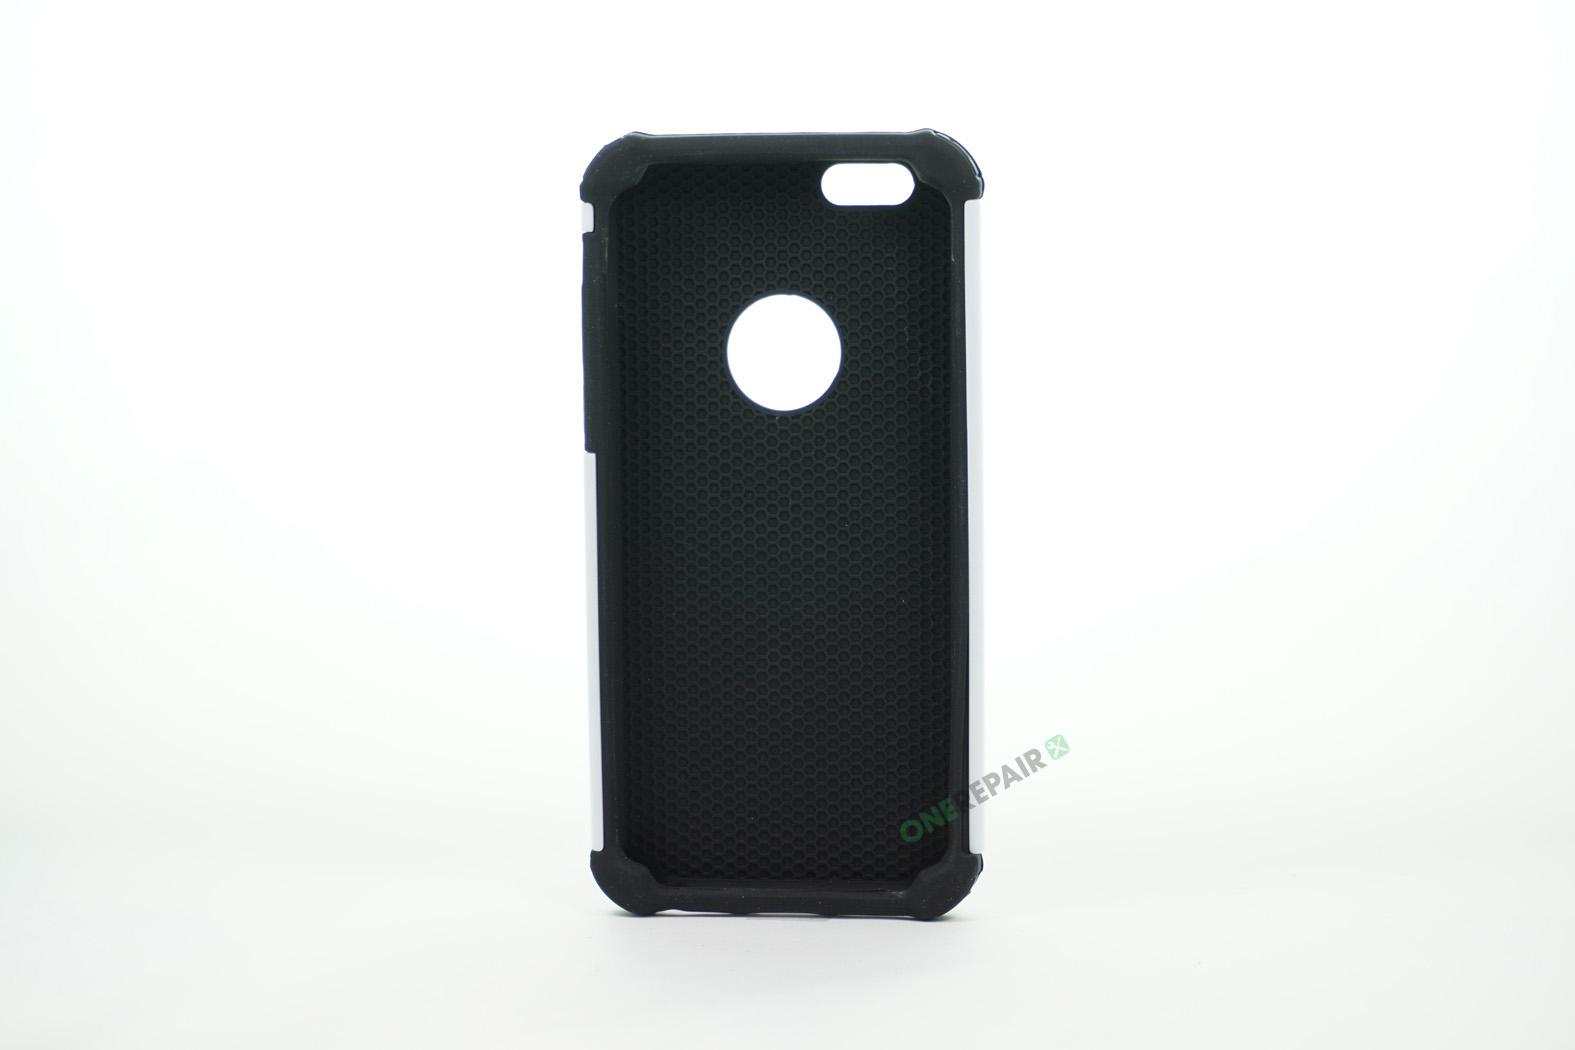 350528_iPhone_6_6S_Haandvaerkercover_Hardcase_Cover_Hvid_OneRepair_00003